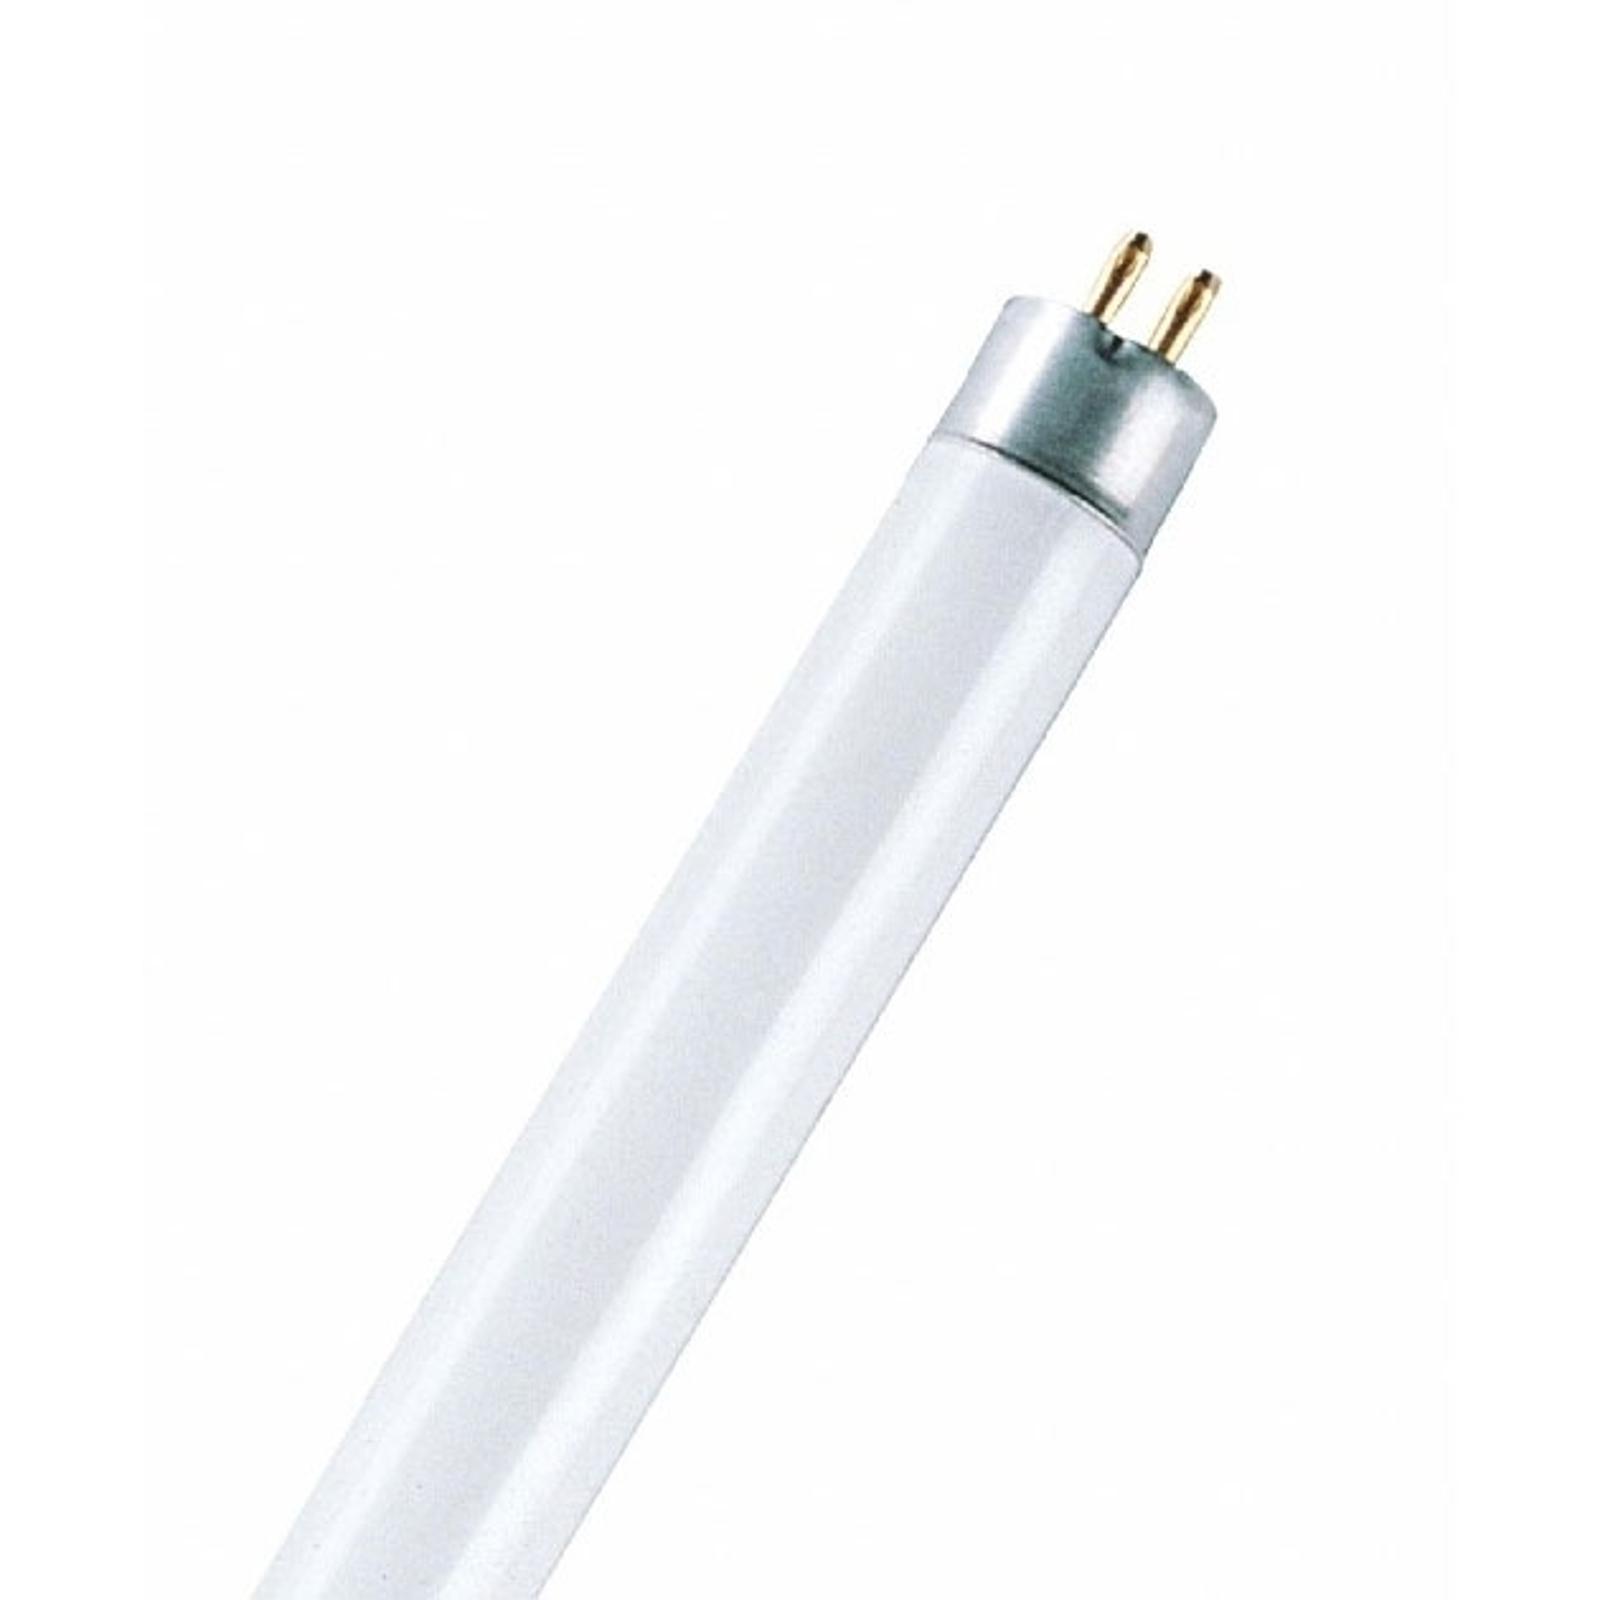 Osram Emergency Lighting G5 T5 840 8W